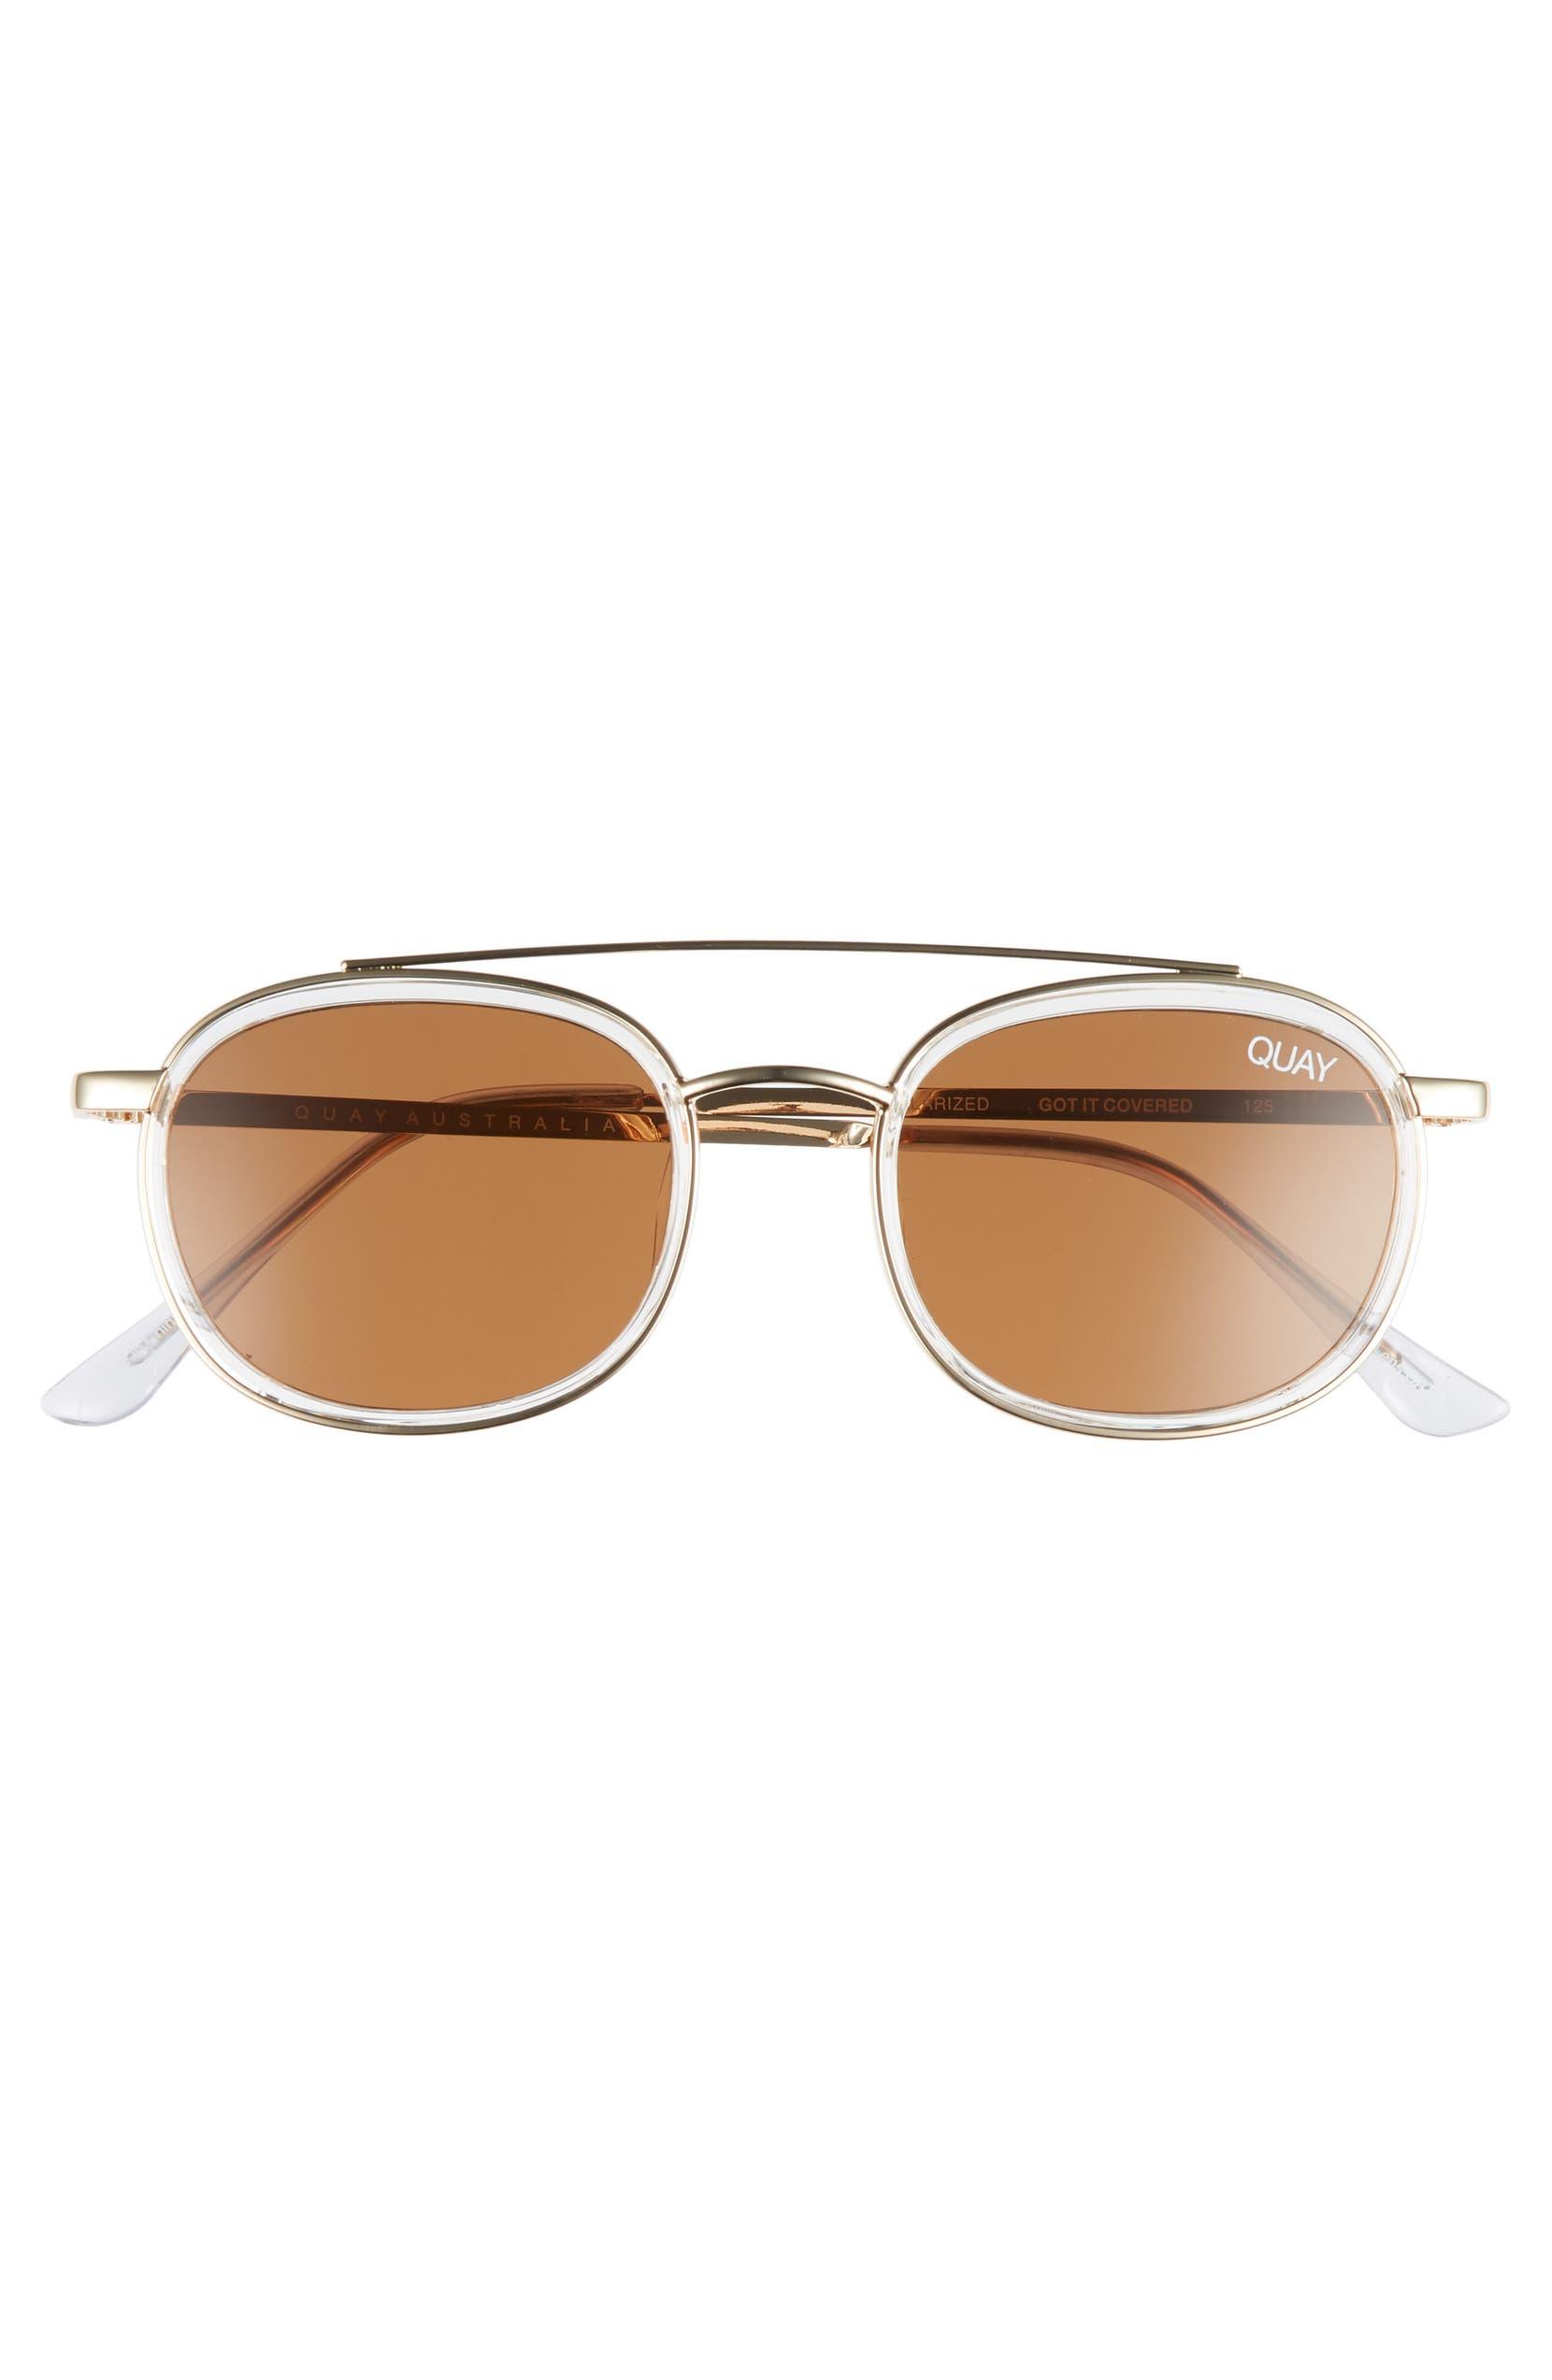 d439afa56afe5 Quay Australia Got It Covered 50mm Polarized Sunglasses